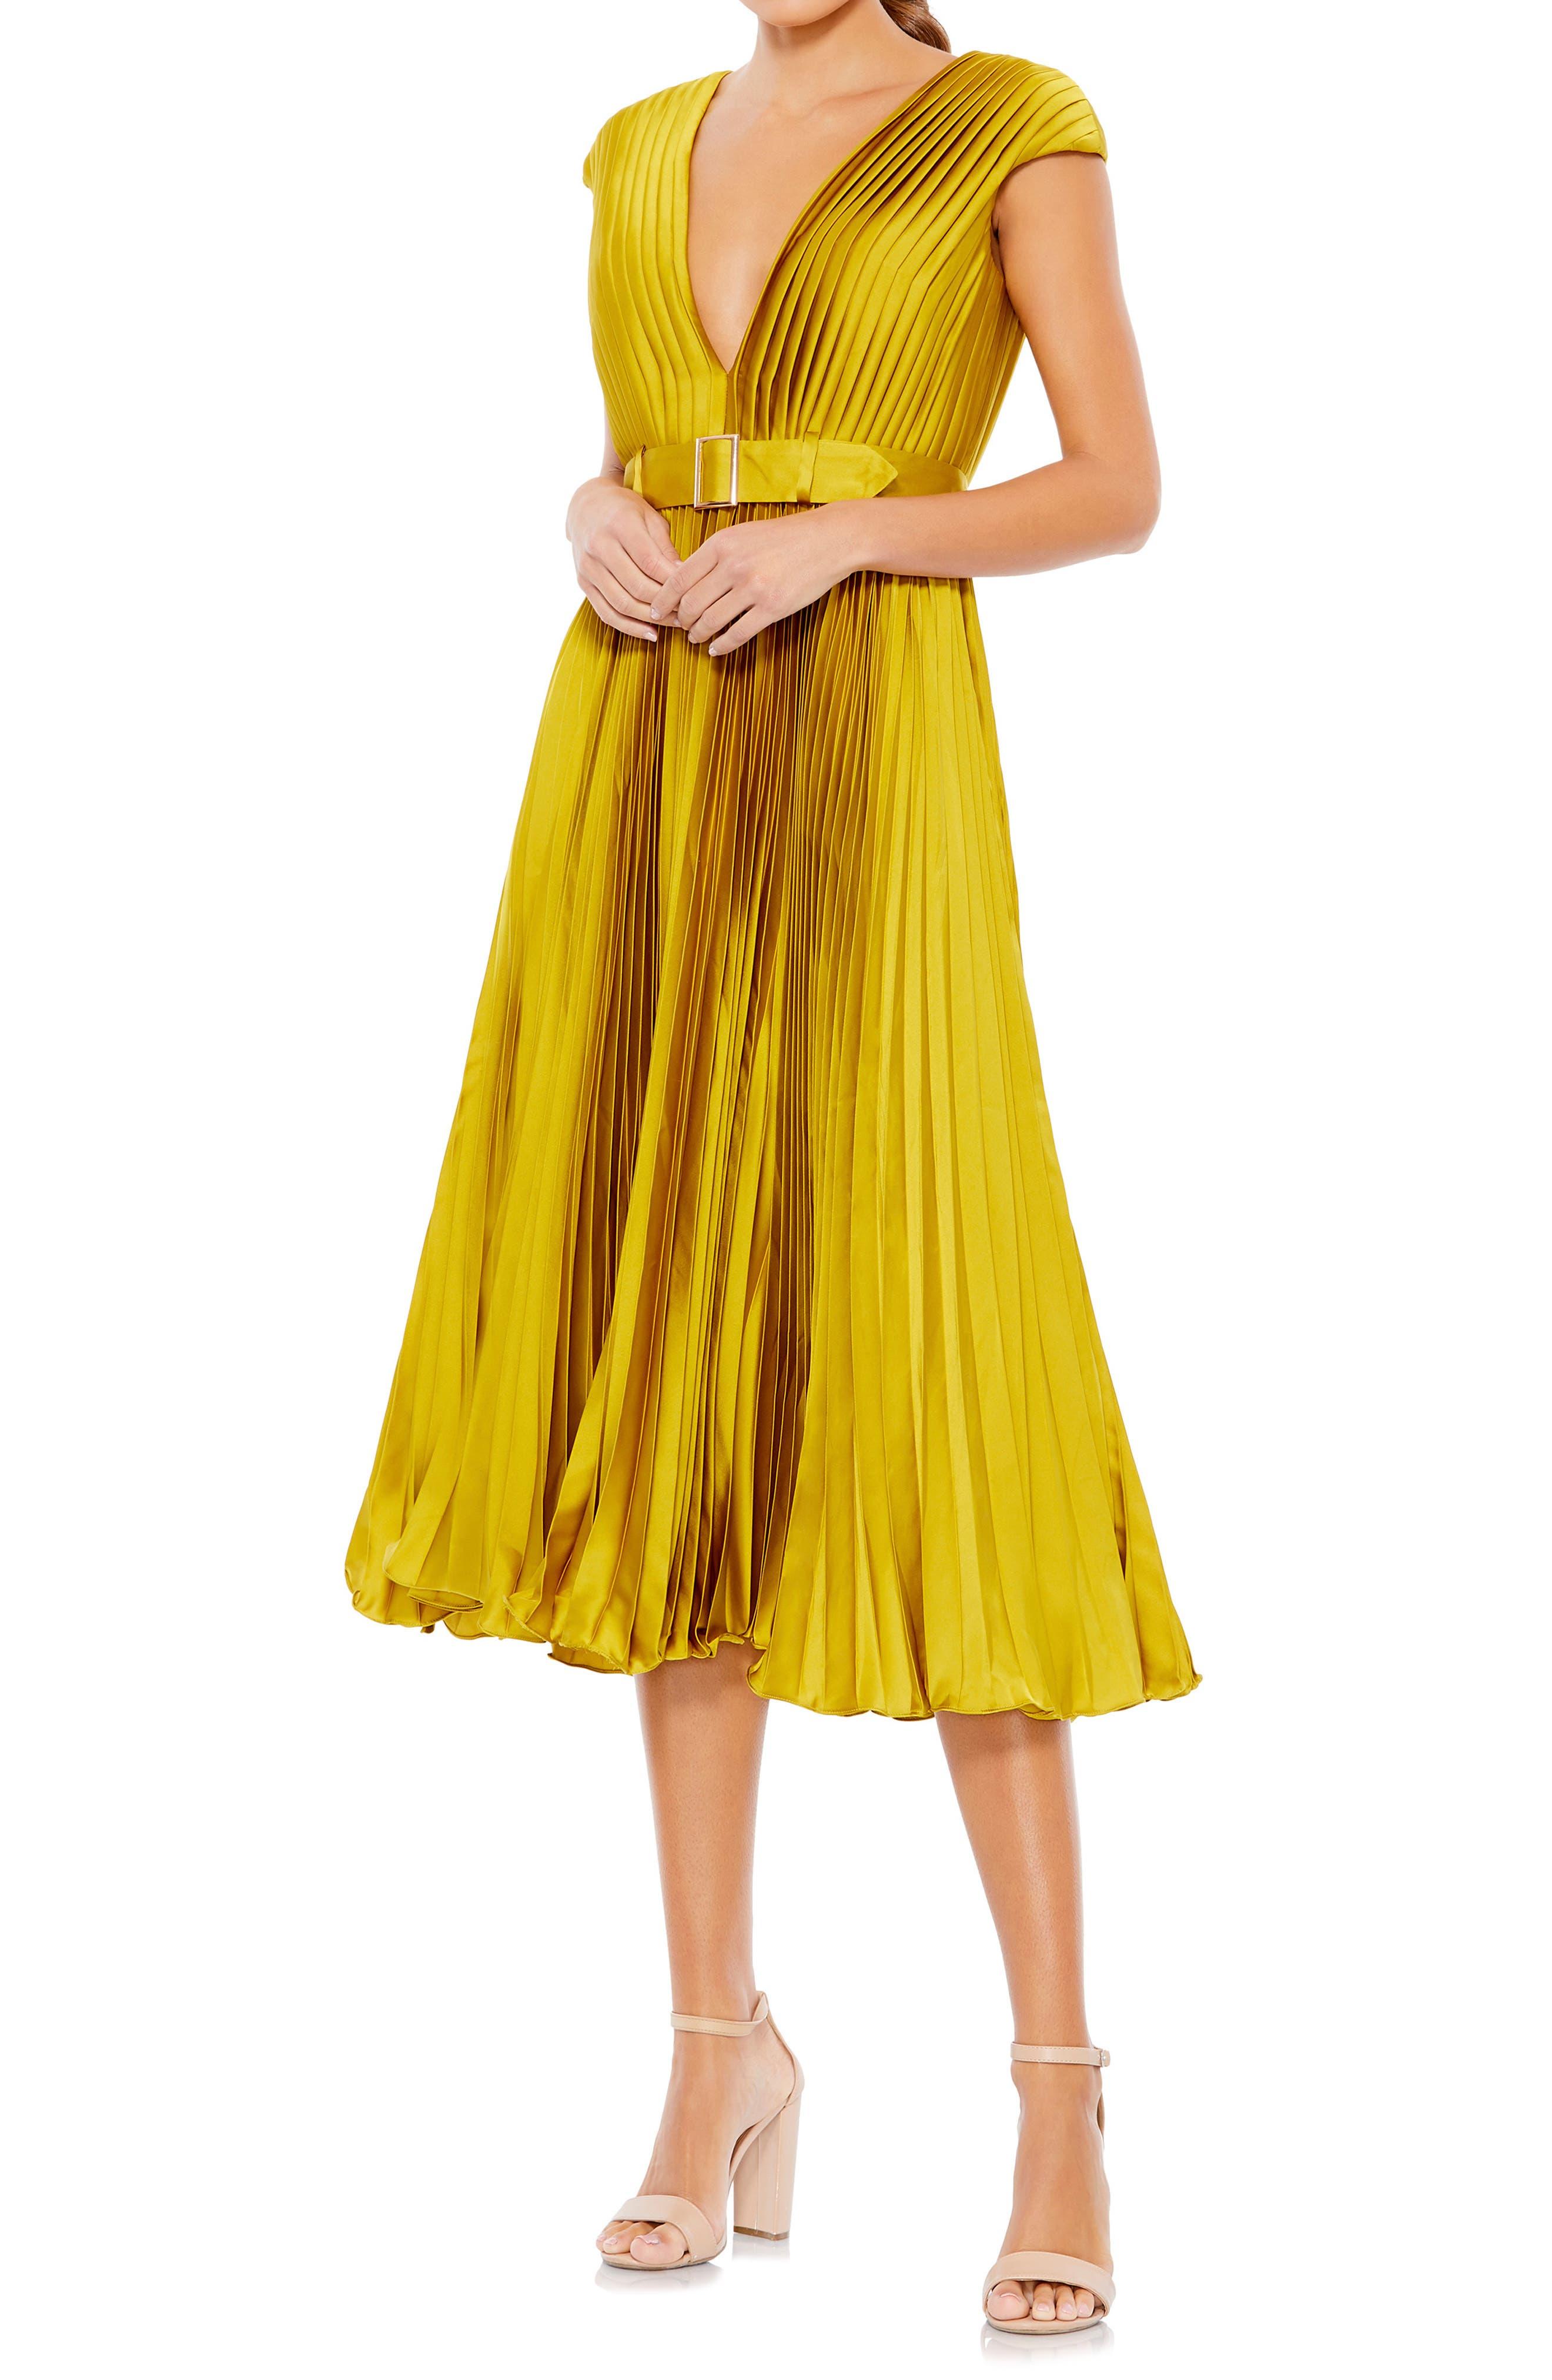 70s Dresses – Disco Dress, Hippie Dress, Wrap Dress Womens MAC Duggal Pleated Cap Sleeve Satin Midi Gown Size 16 - Yellow $338.00 AT vintagedancer.com